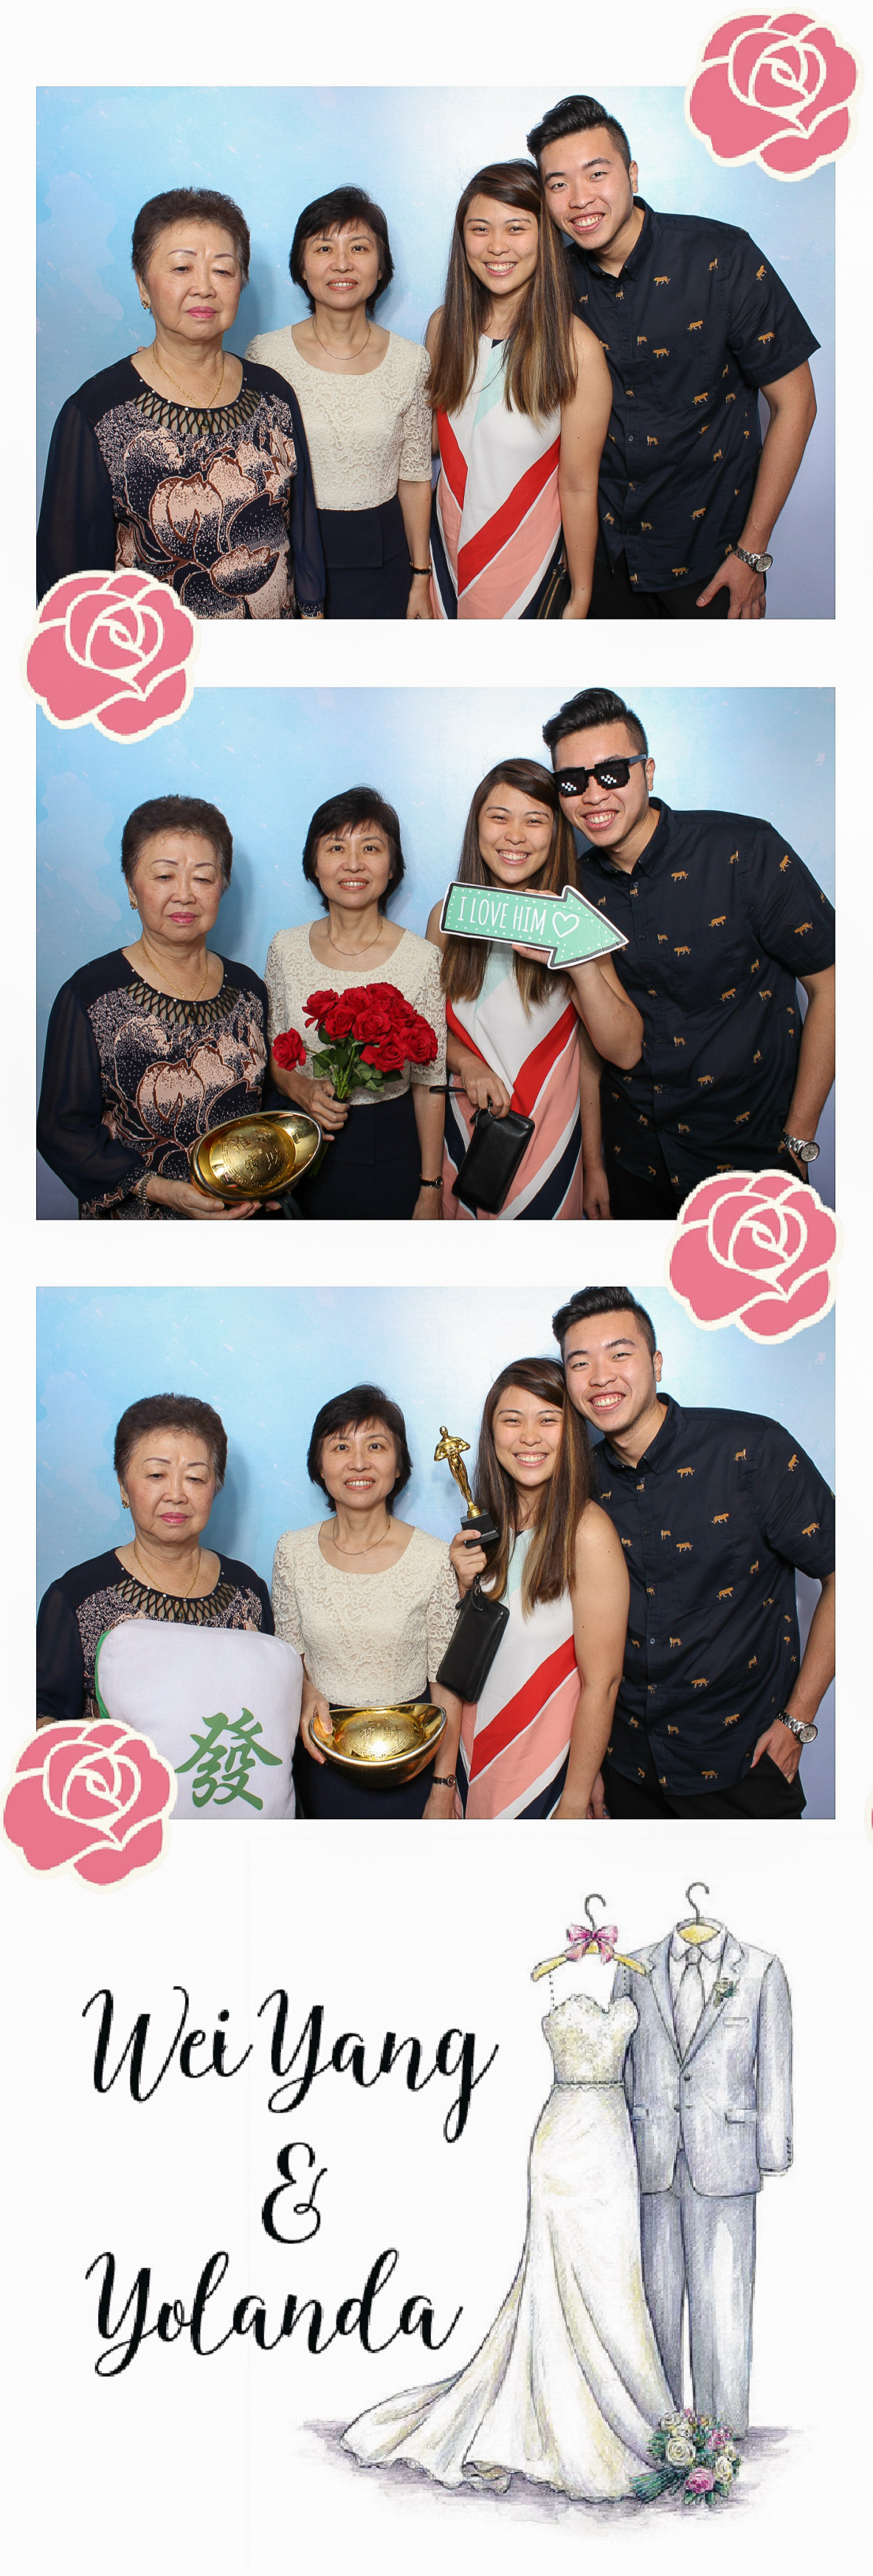 Photobooth 1706-22